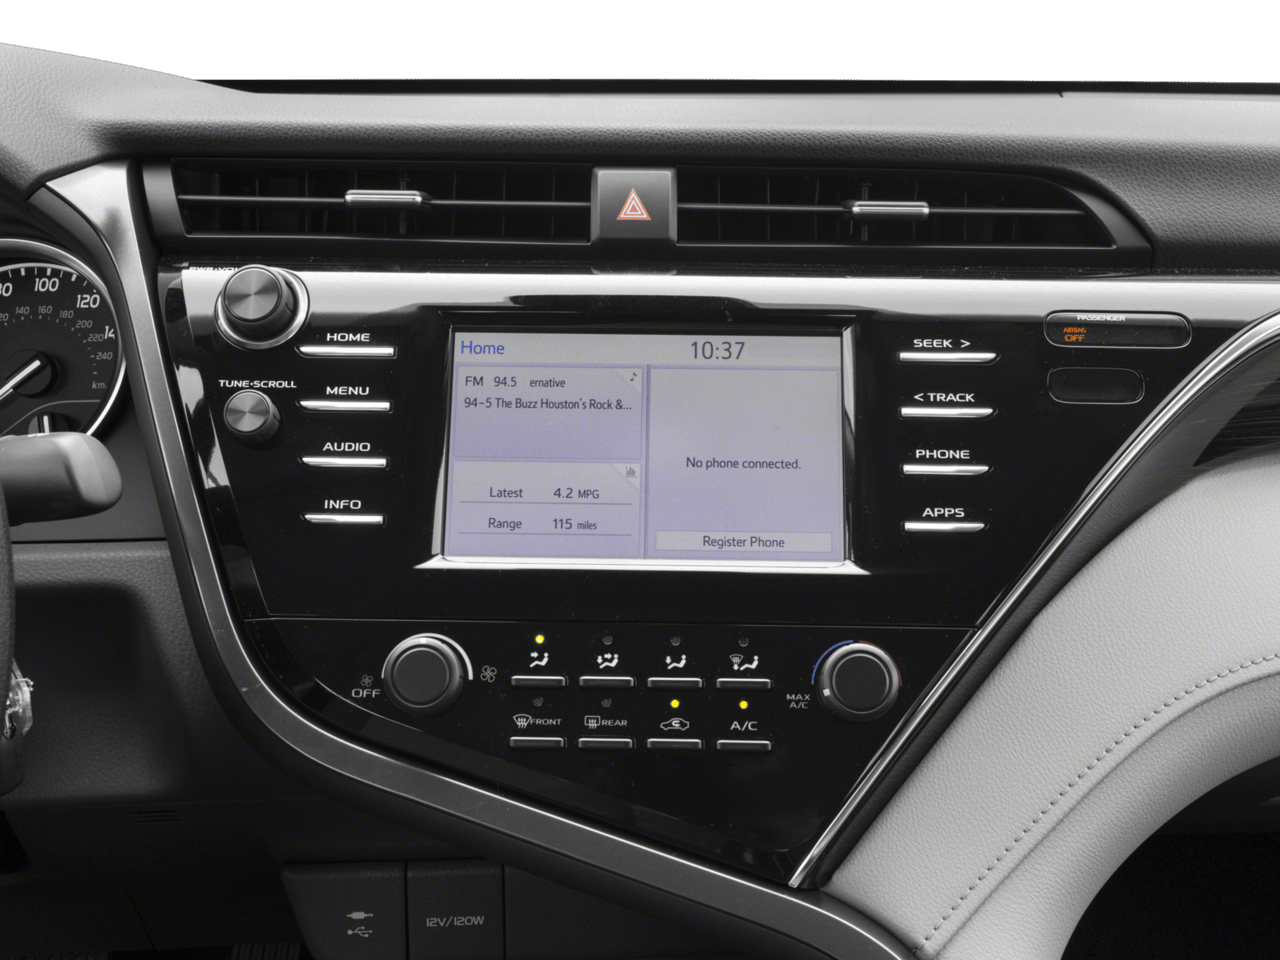 Toyota Display screen